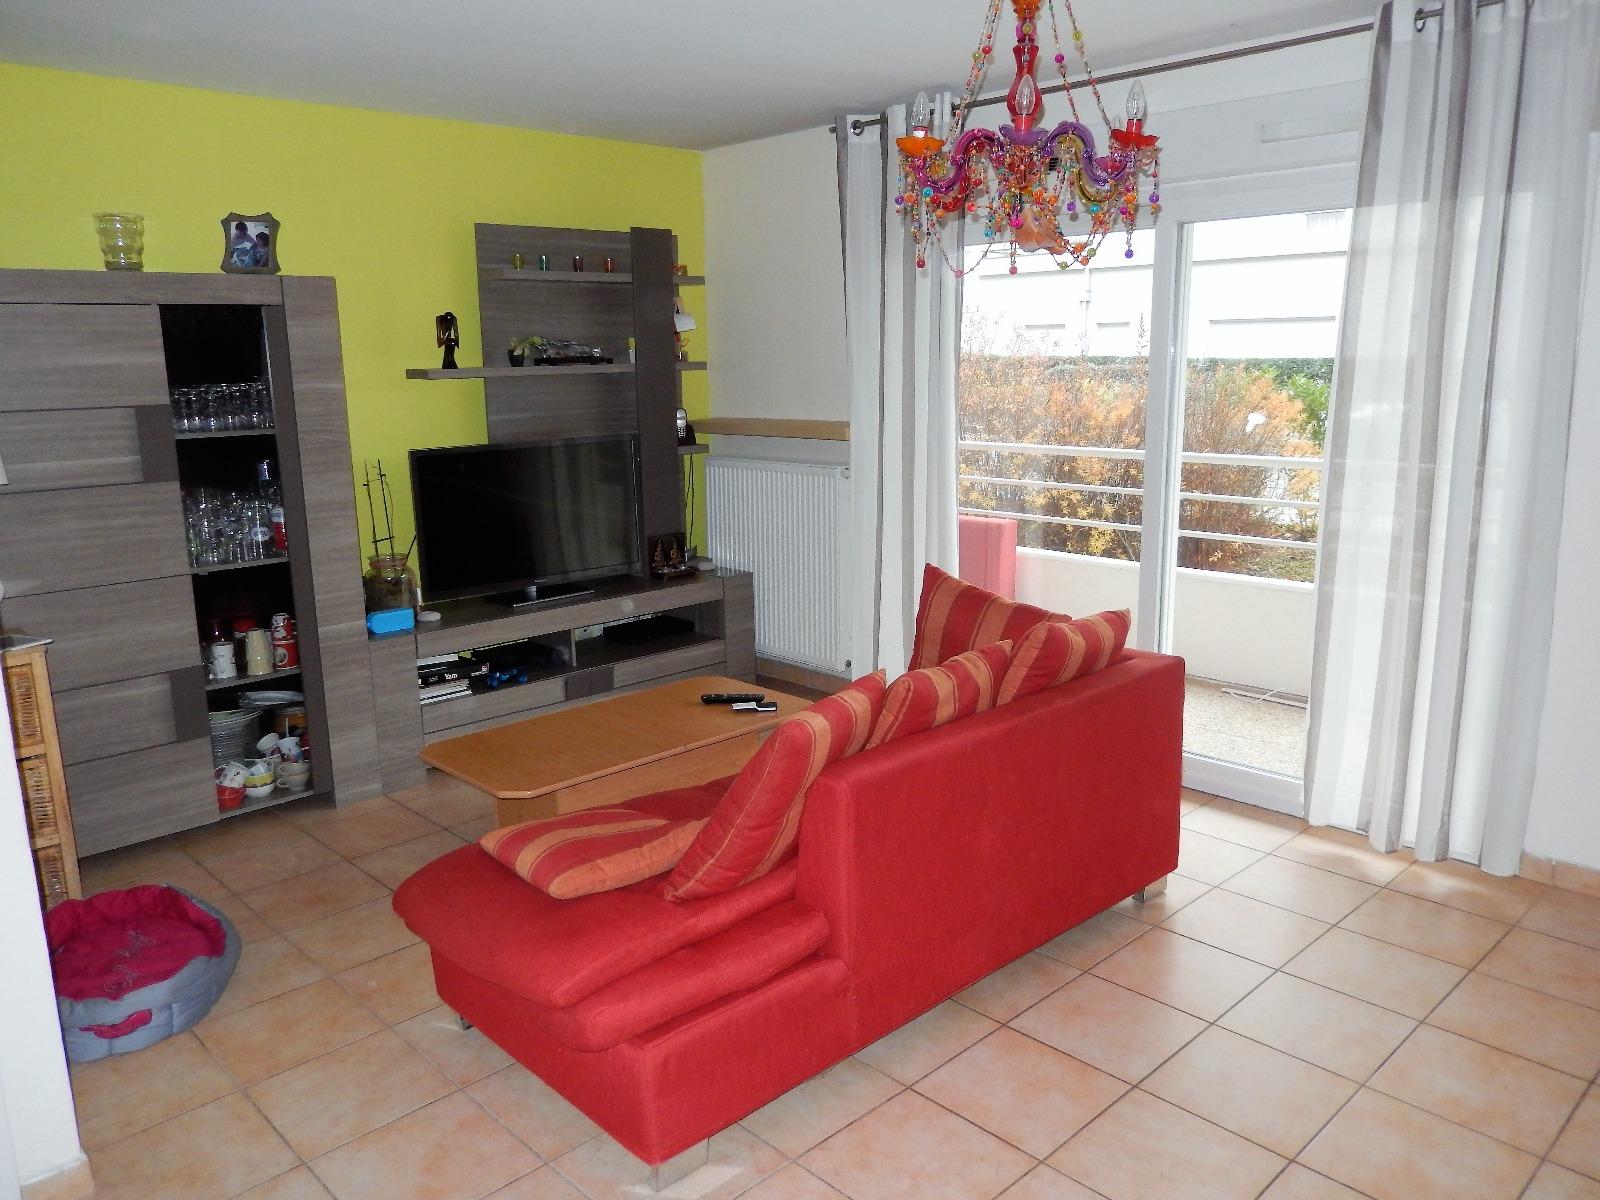 Appartement t3 avec terrasse vendre annemasse mab for Achat maison annemasse